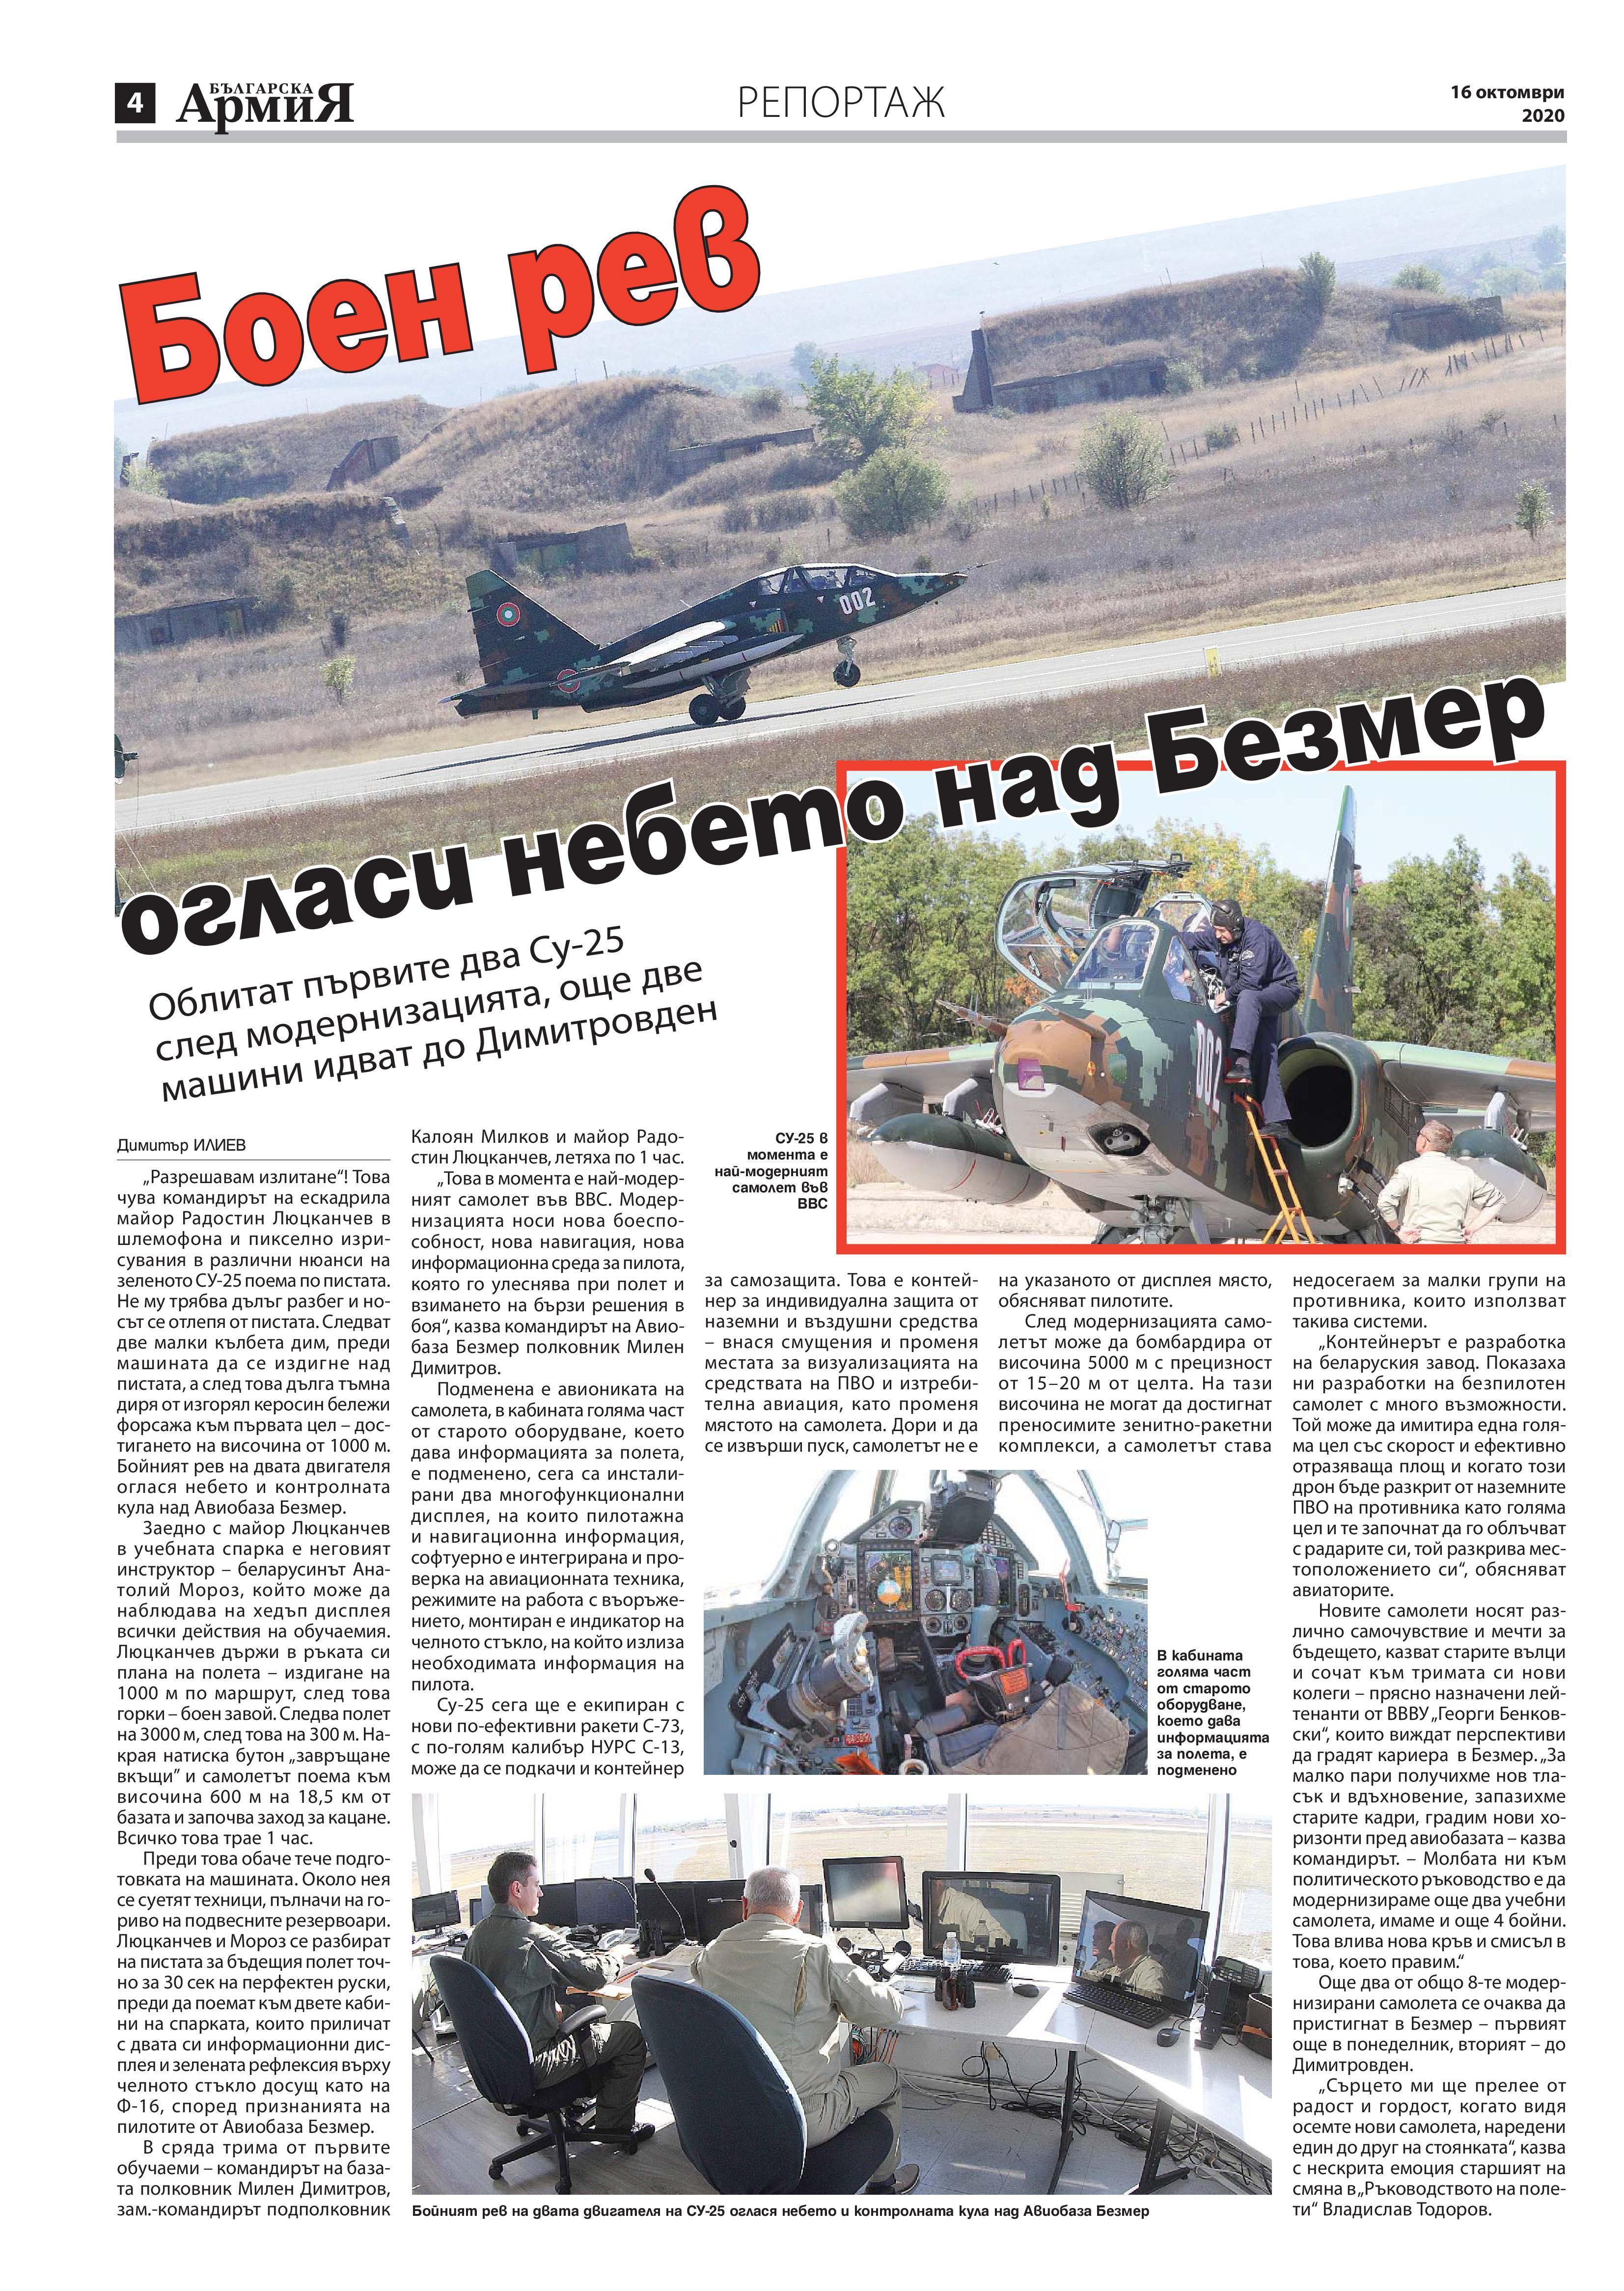 https://armymedia.bg/wp-content/uploads/2015/06/04-43.jpg